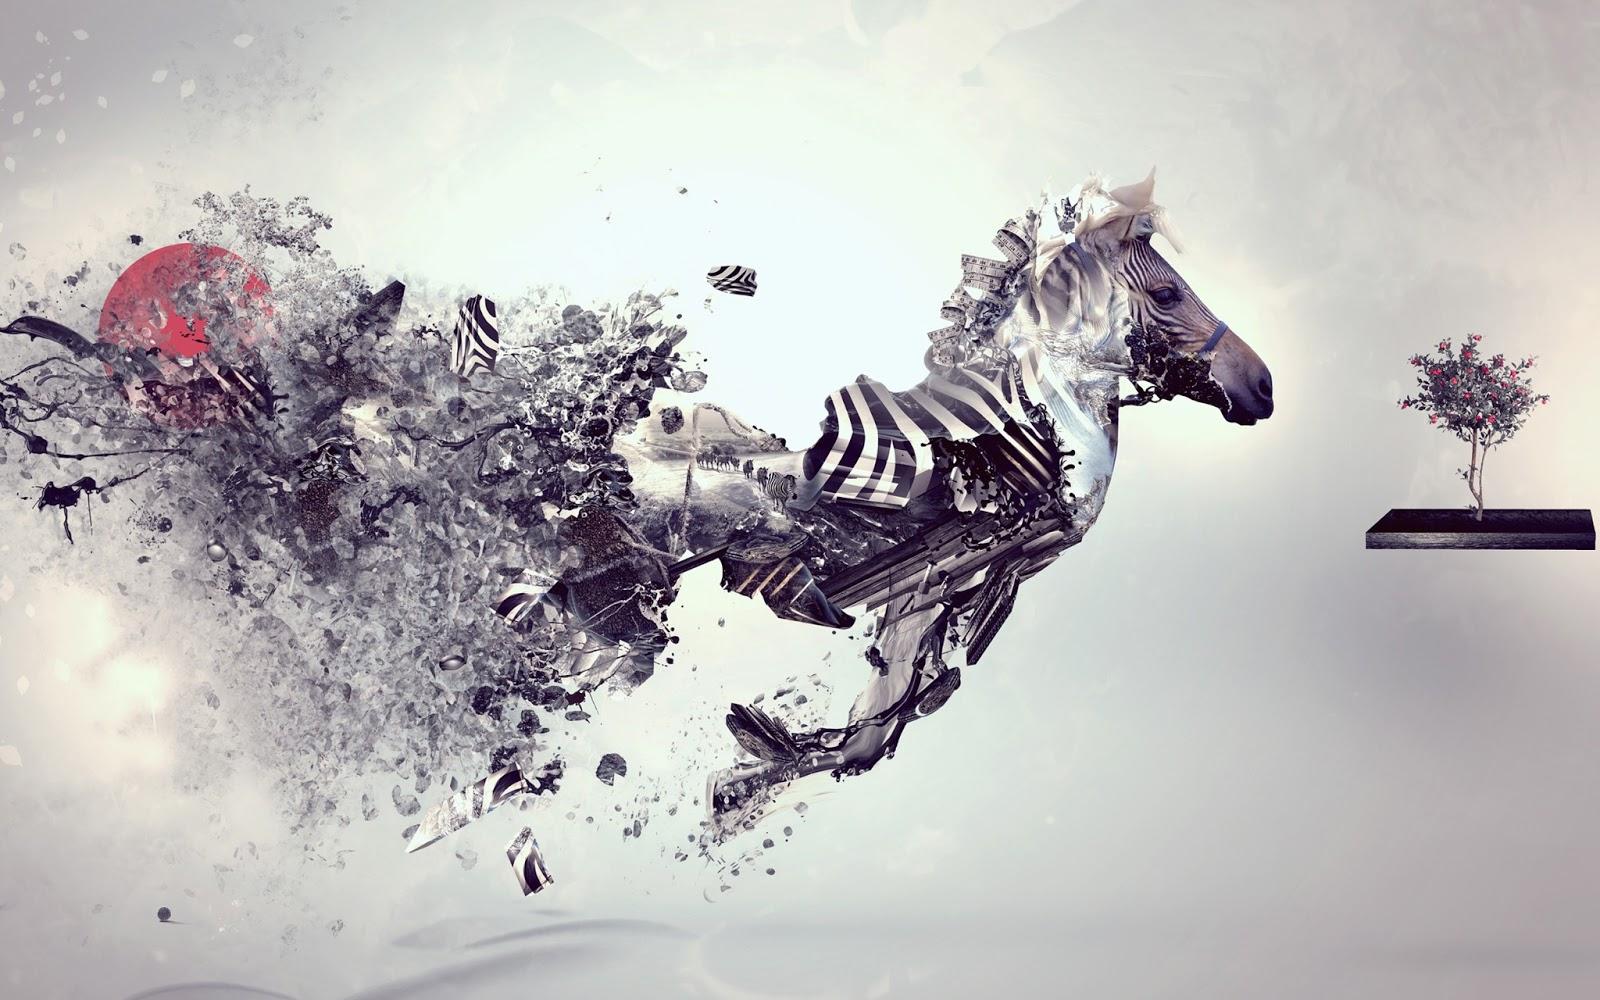 http://3.bp.blogspot.com/-2LIn0XjKIHE/UPgNGzOyoqI/AAAAAAAAzrg/n0m1mPYv2gA/s1600/Zebra-Wallpaper-Abstrato_Fondos-de-Pantalla-de-Zebras.jpg